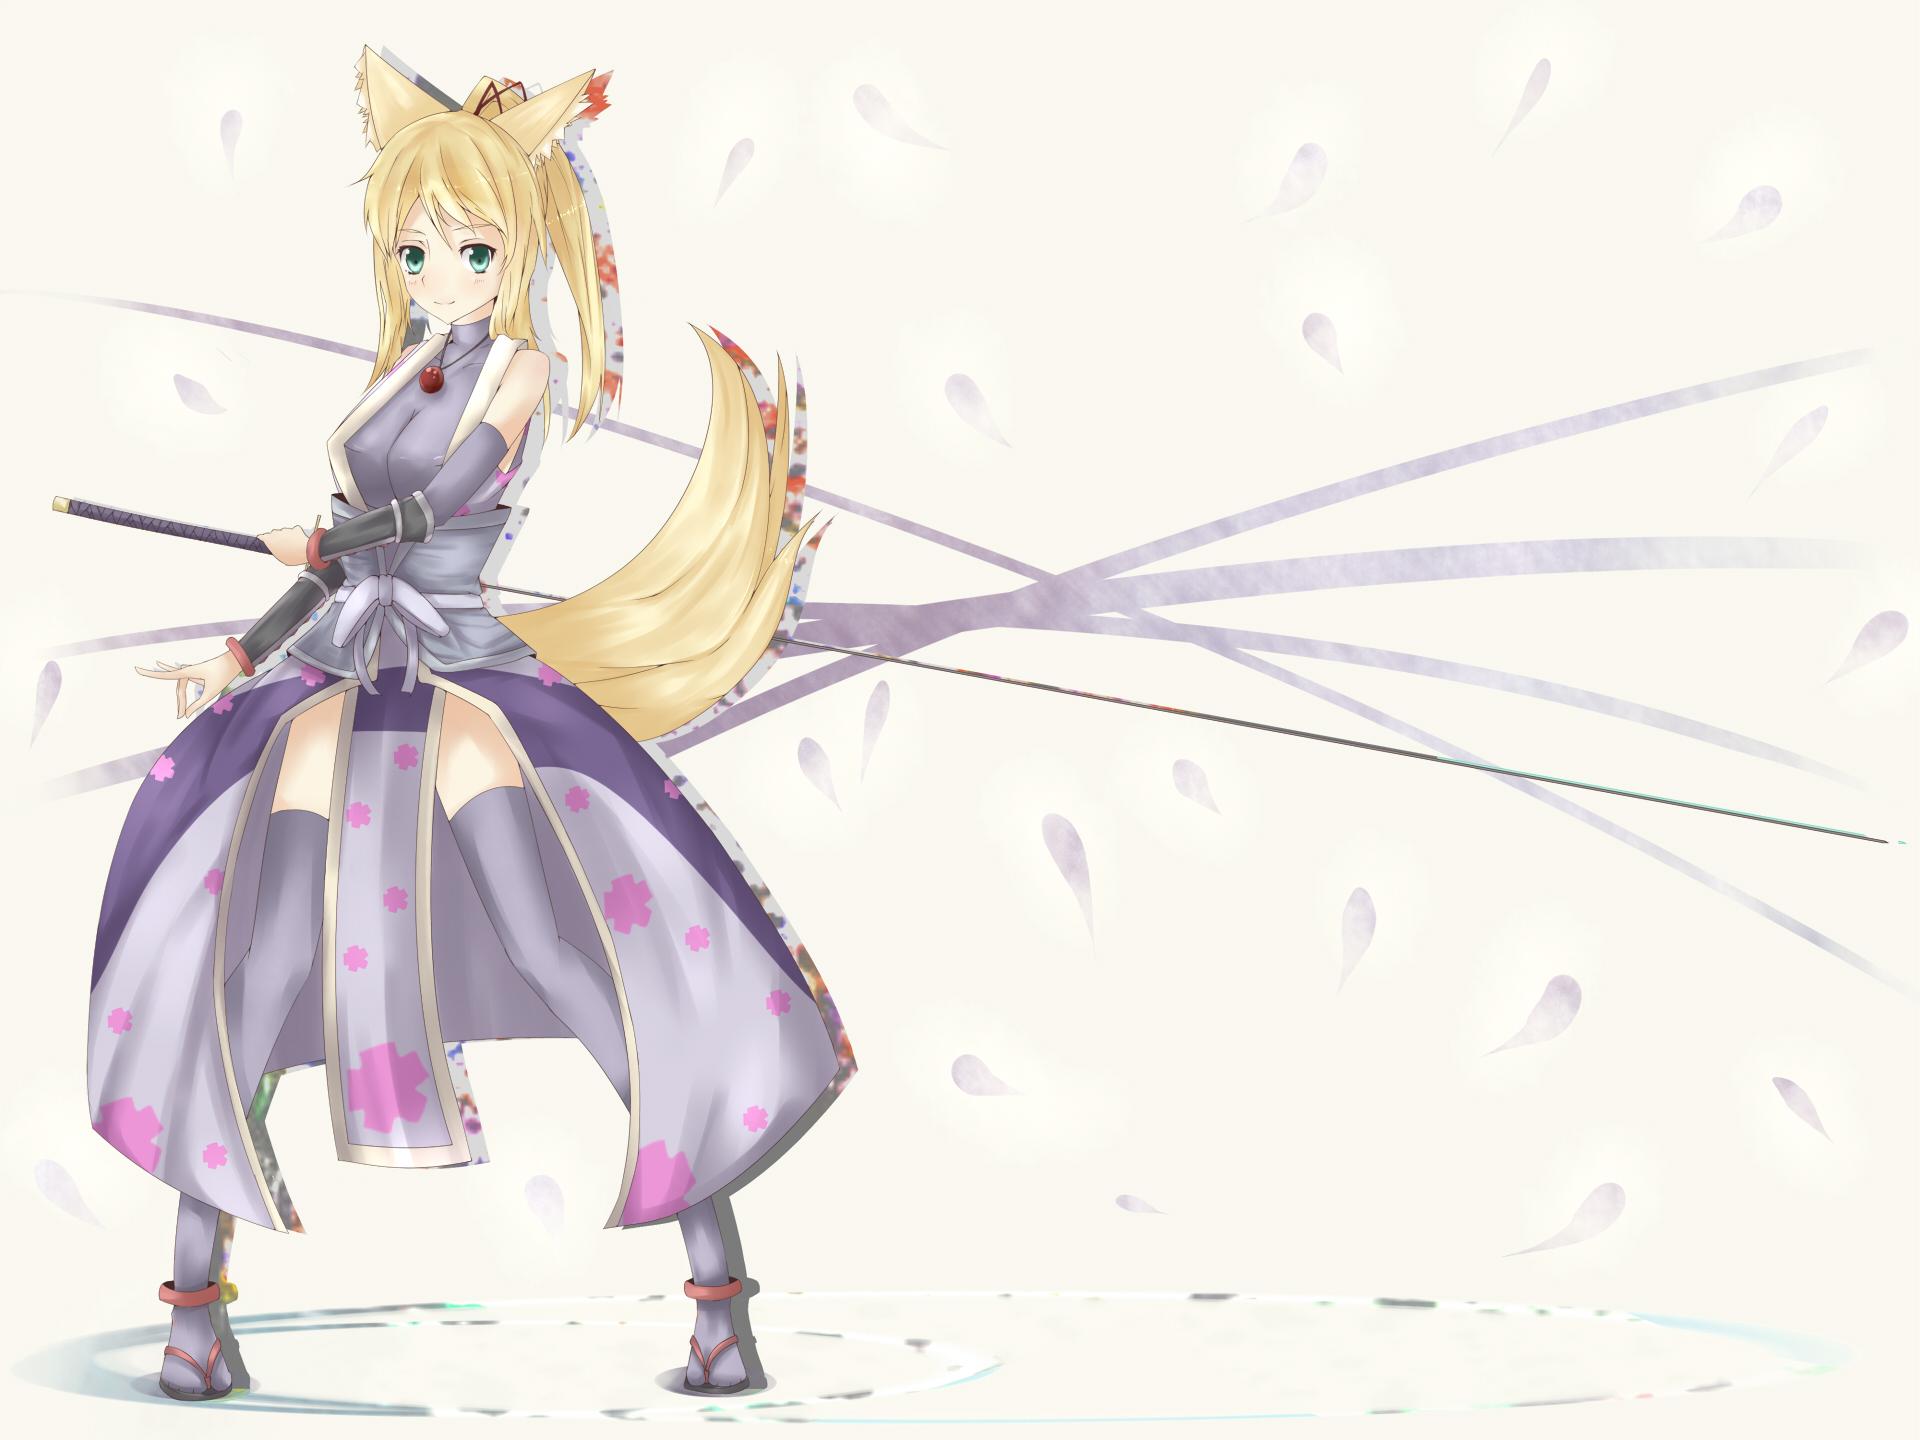 Anime Yukikaze Images, Photos, Reviews